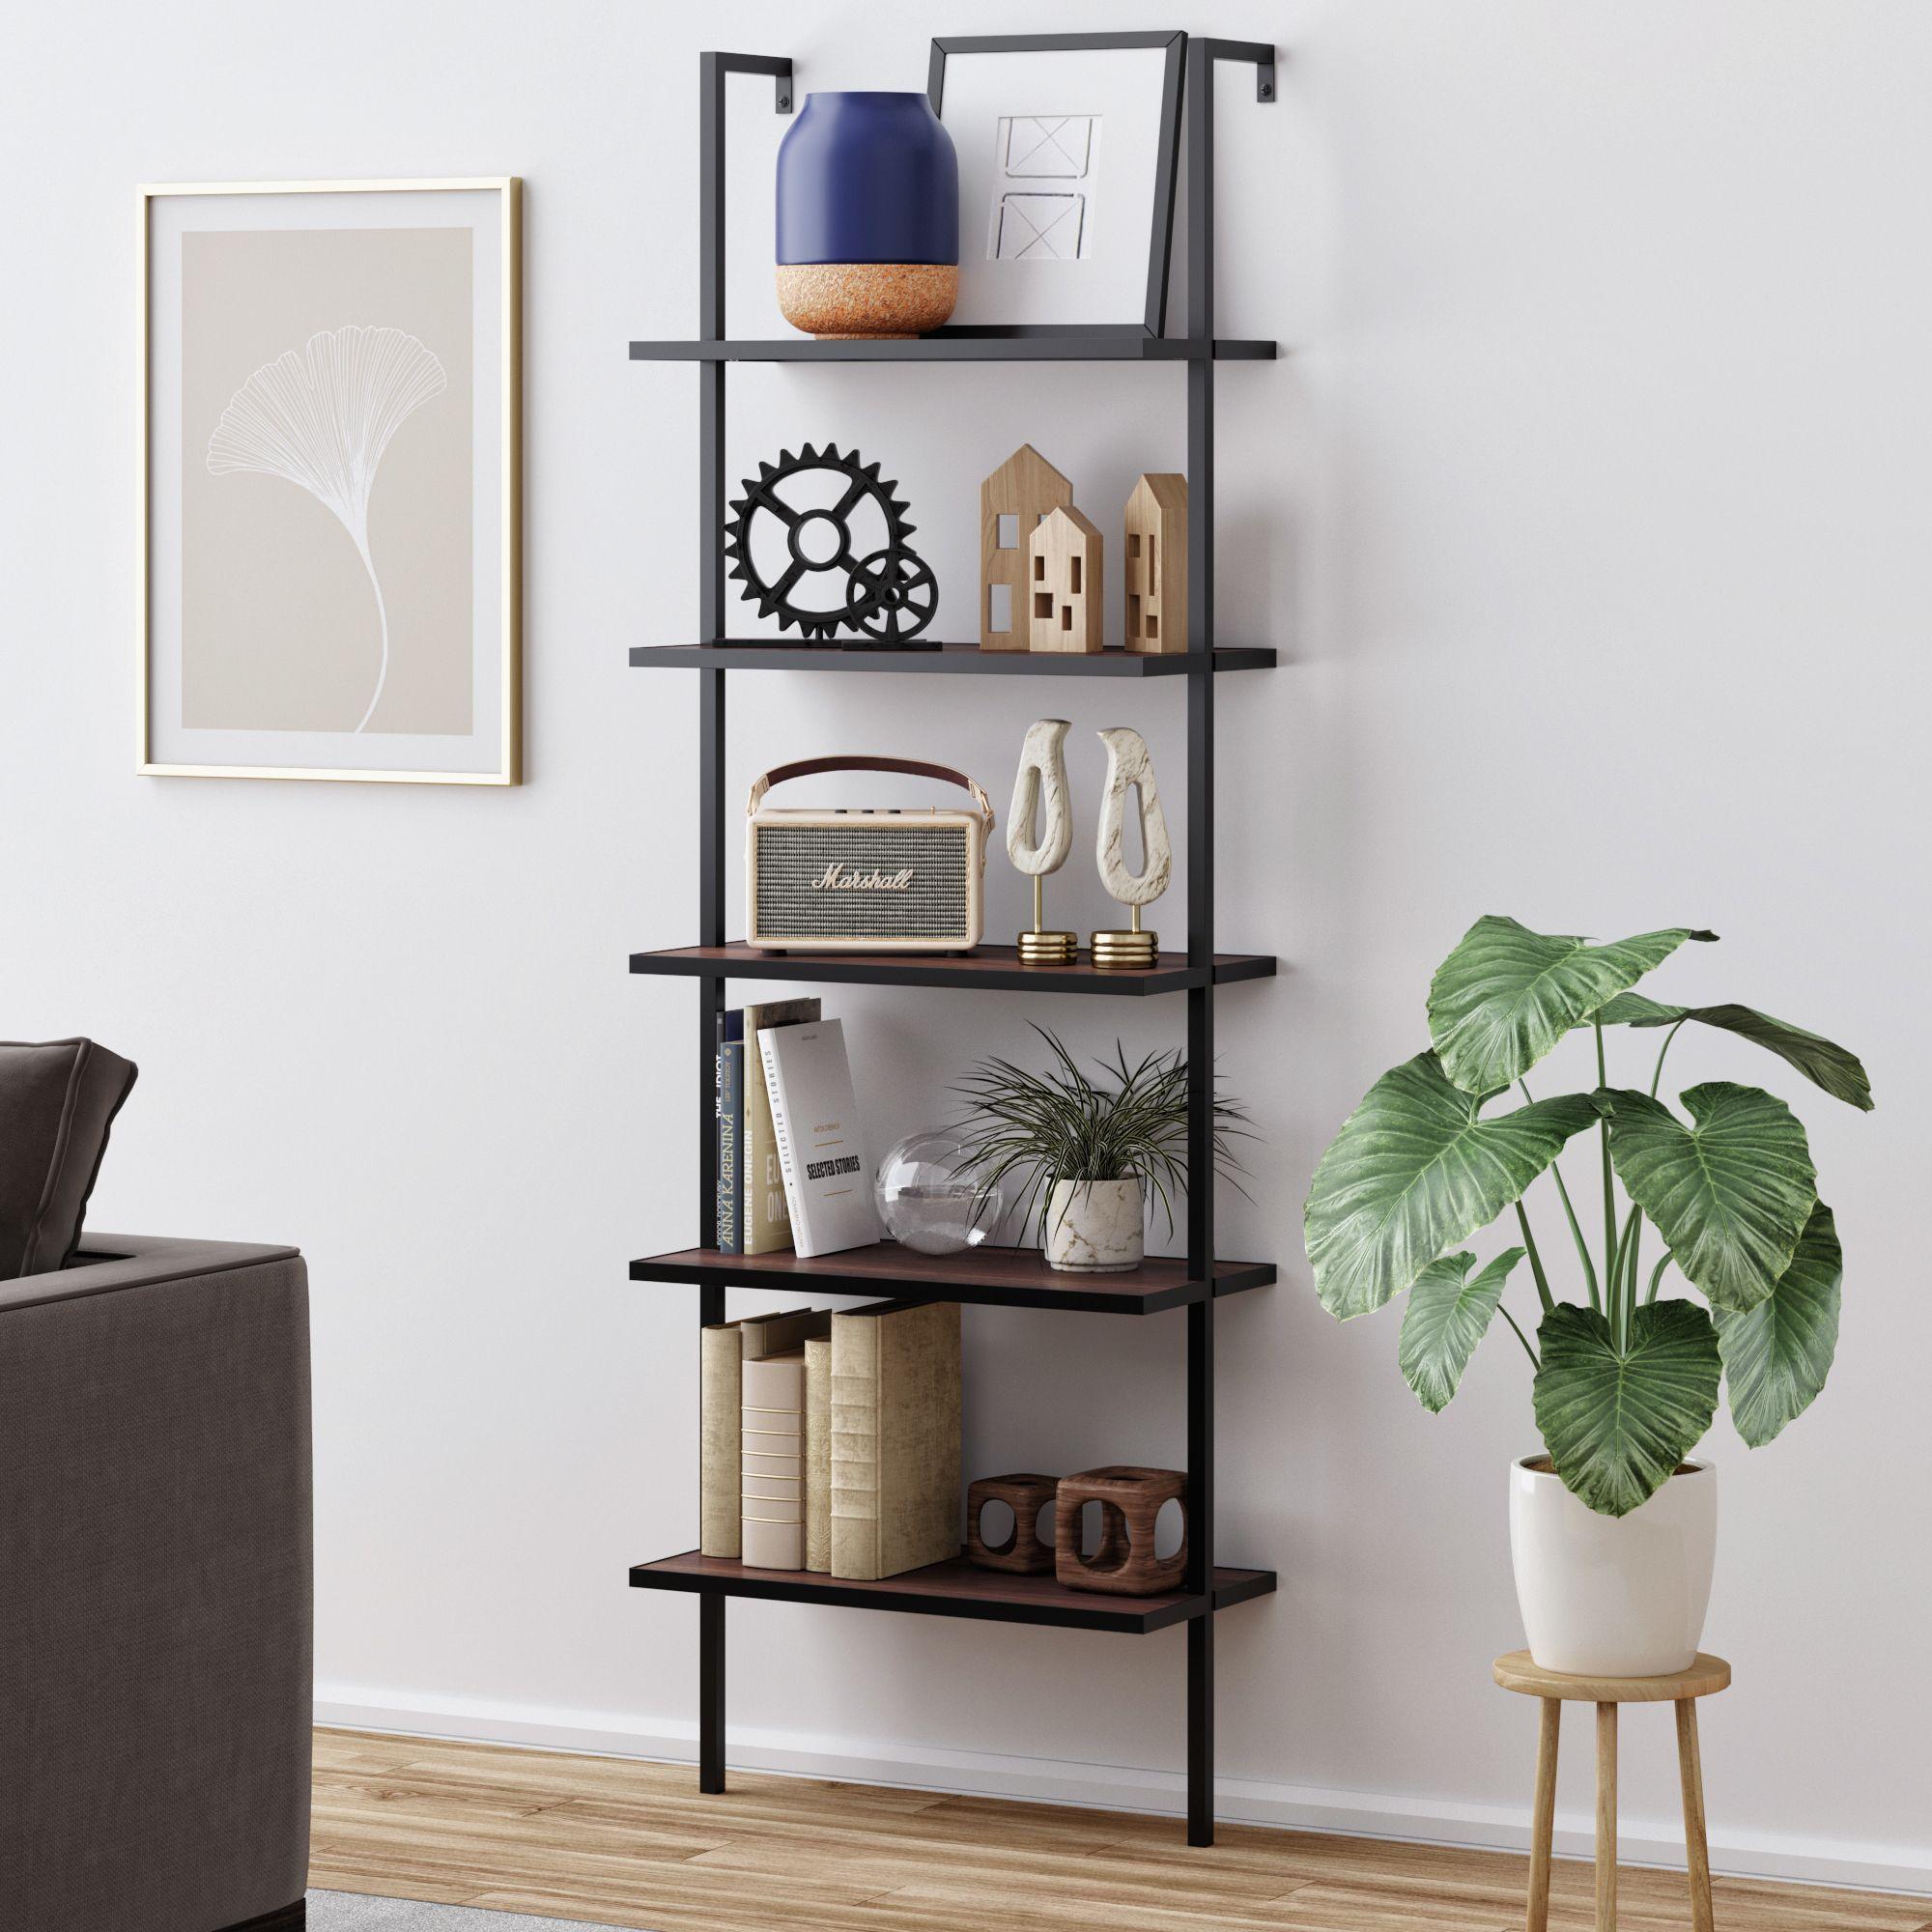 Nathan James Theo 5 Shelf Ladder Bookcase Walnut Brown Wood Black Metal Frame Walmart Com In 2021 Ladder Bookcase Shelves Modern Bookcase Metal and wood ladder shelf